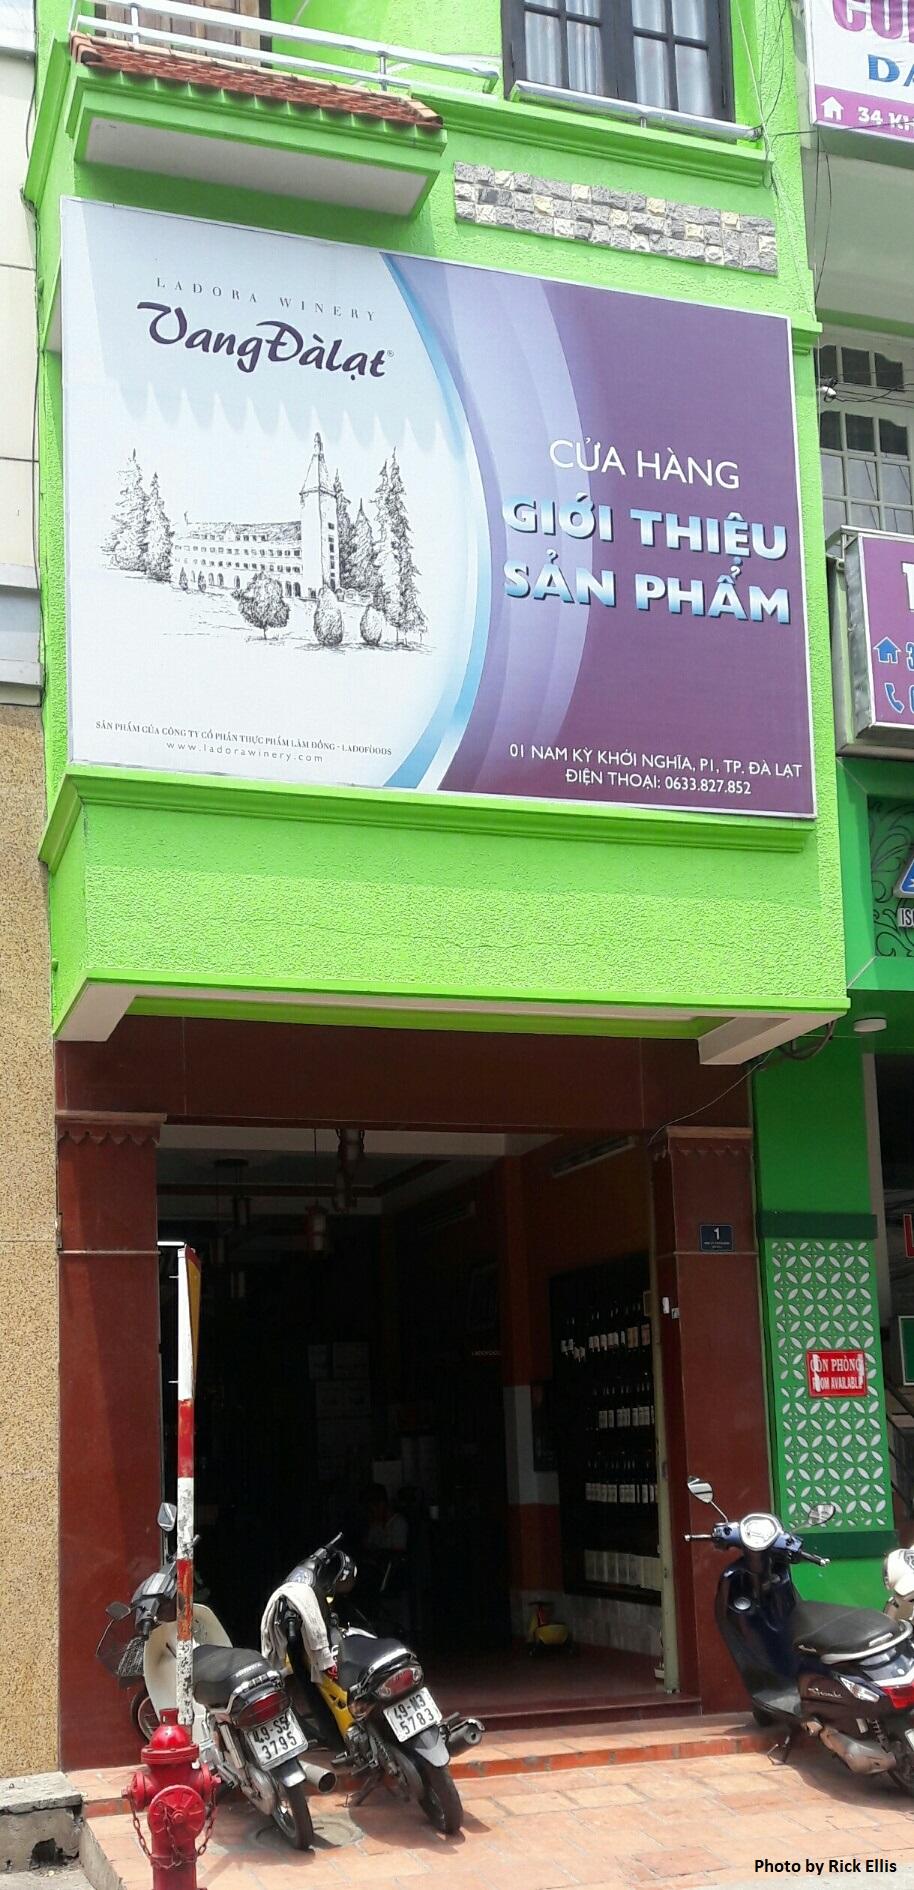 A domestic wine store in Da Lat